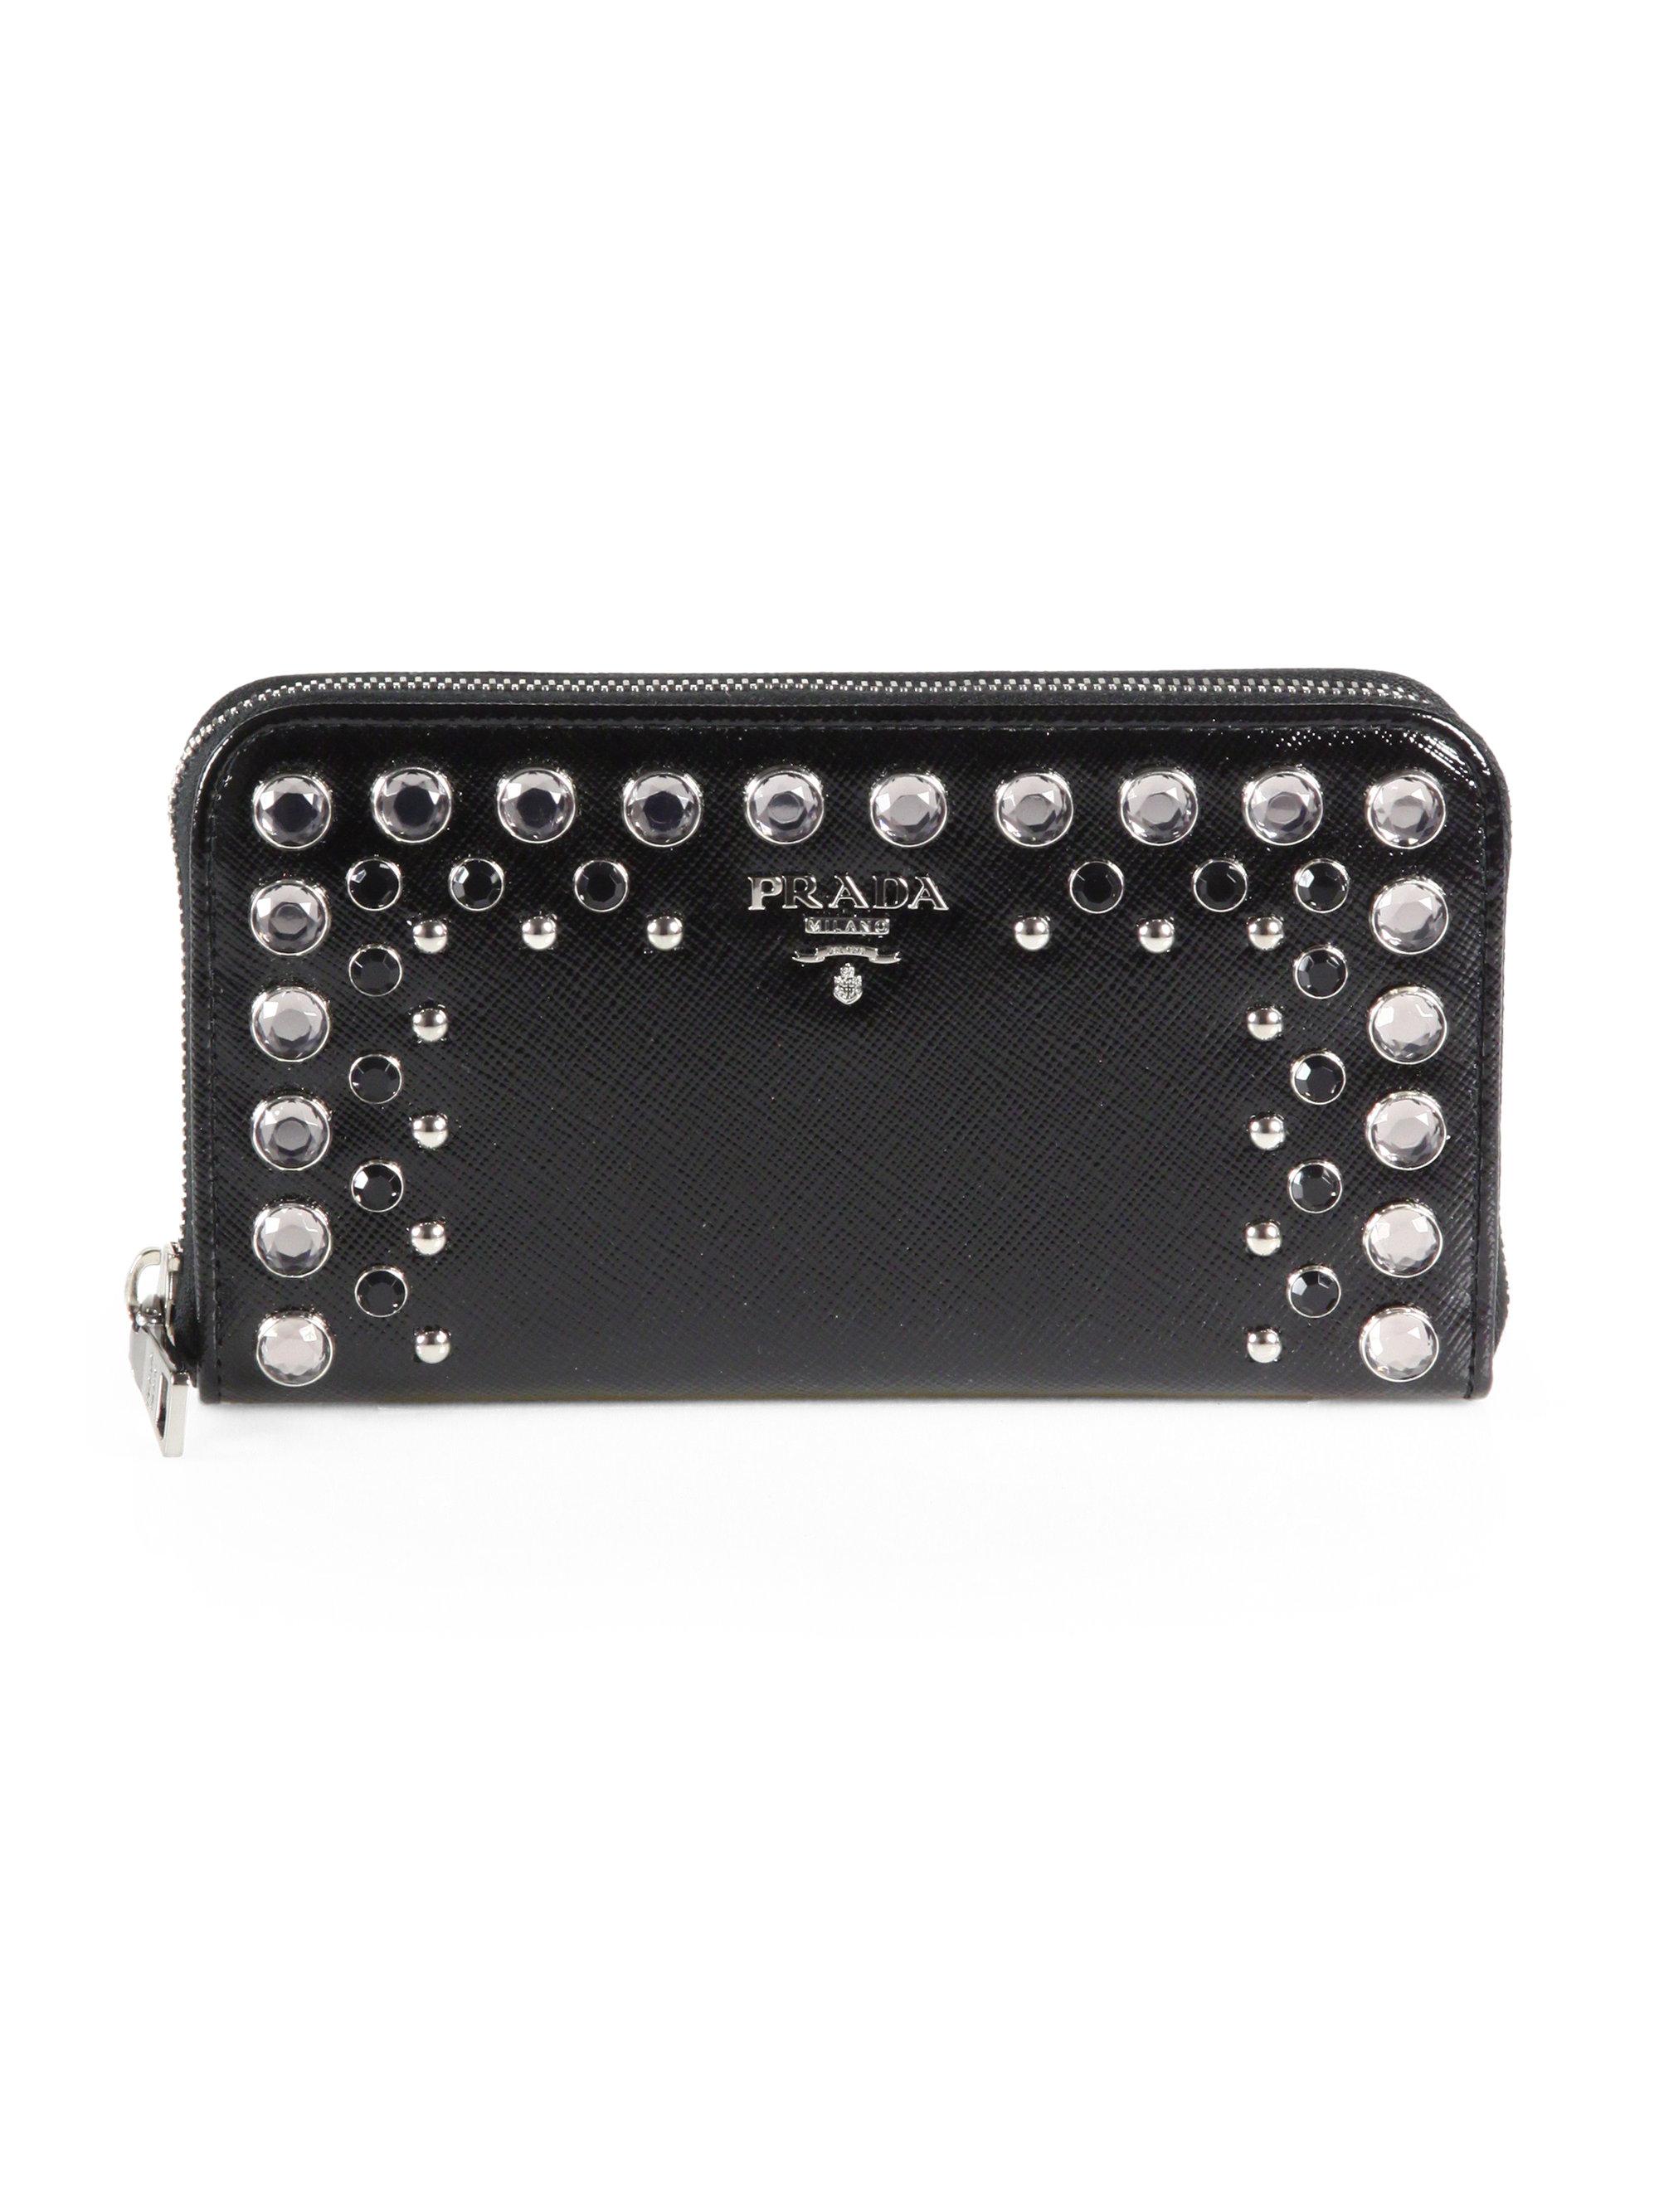 ... discount lyst prada studded saffiano vernice ziparound wallet in black  85fd1 c28a7 c9c5c779c955a